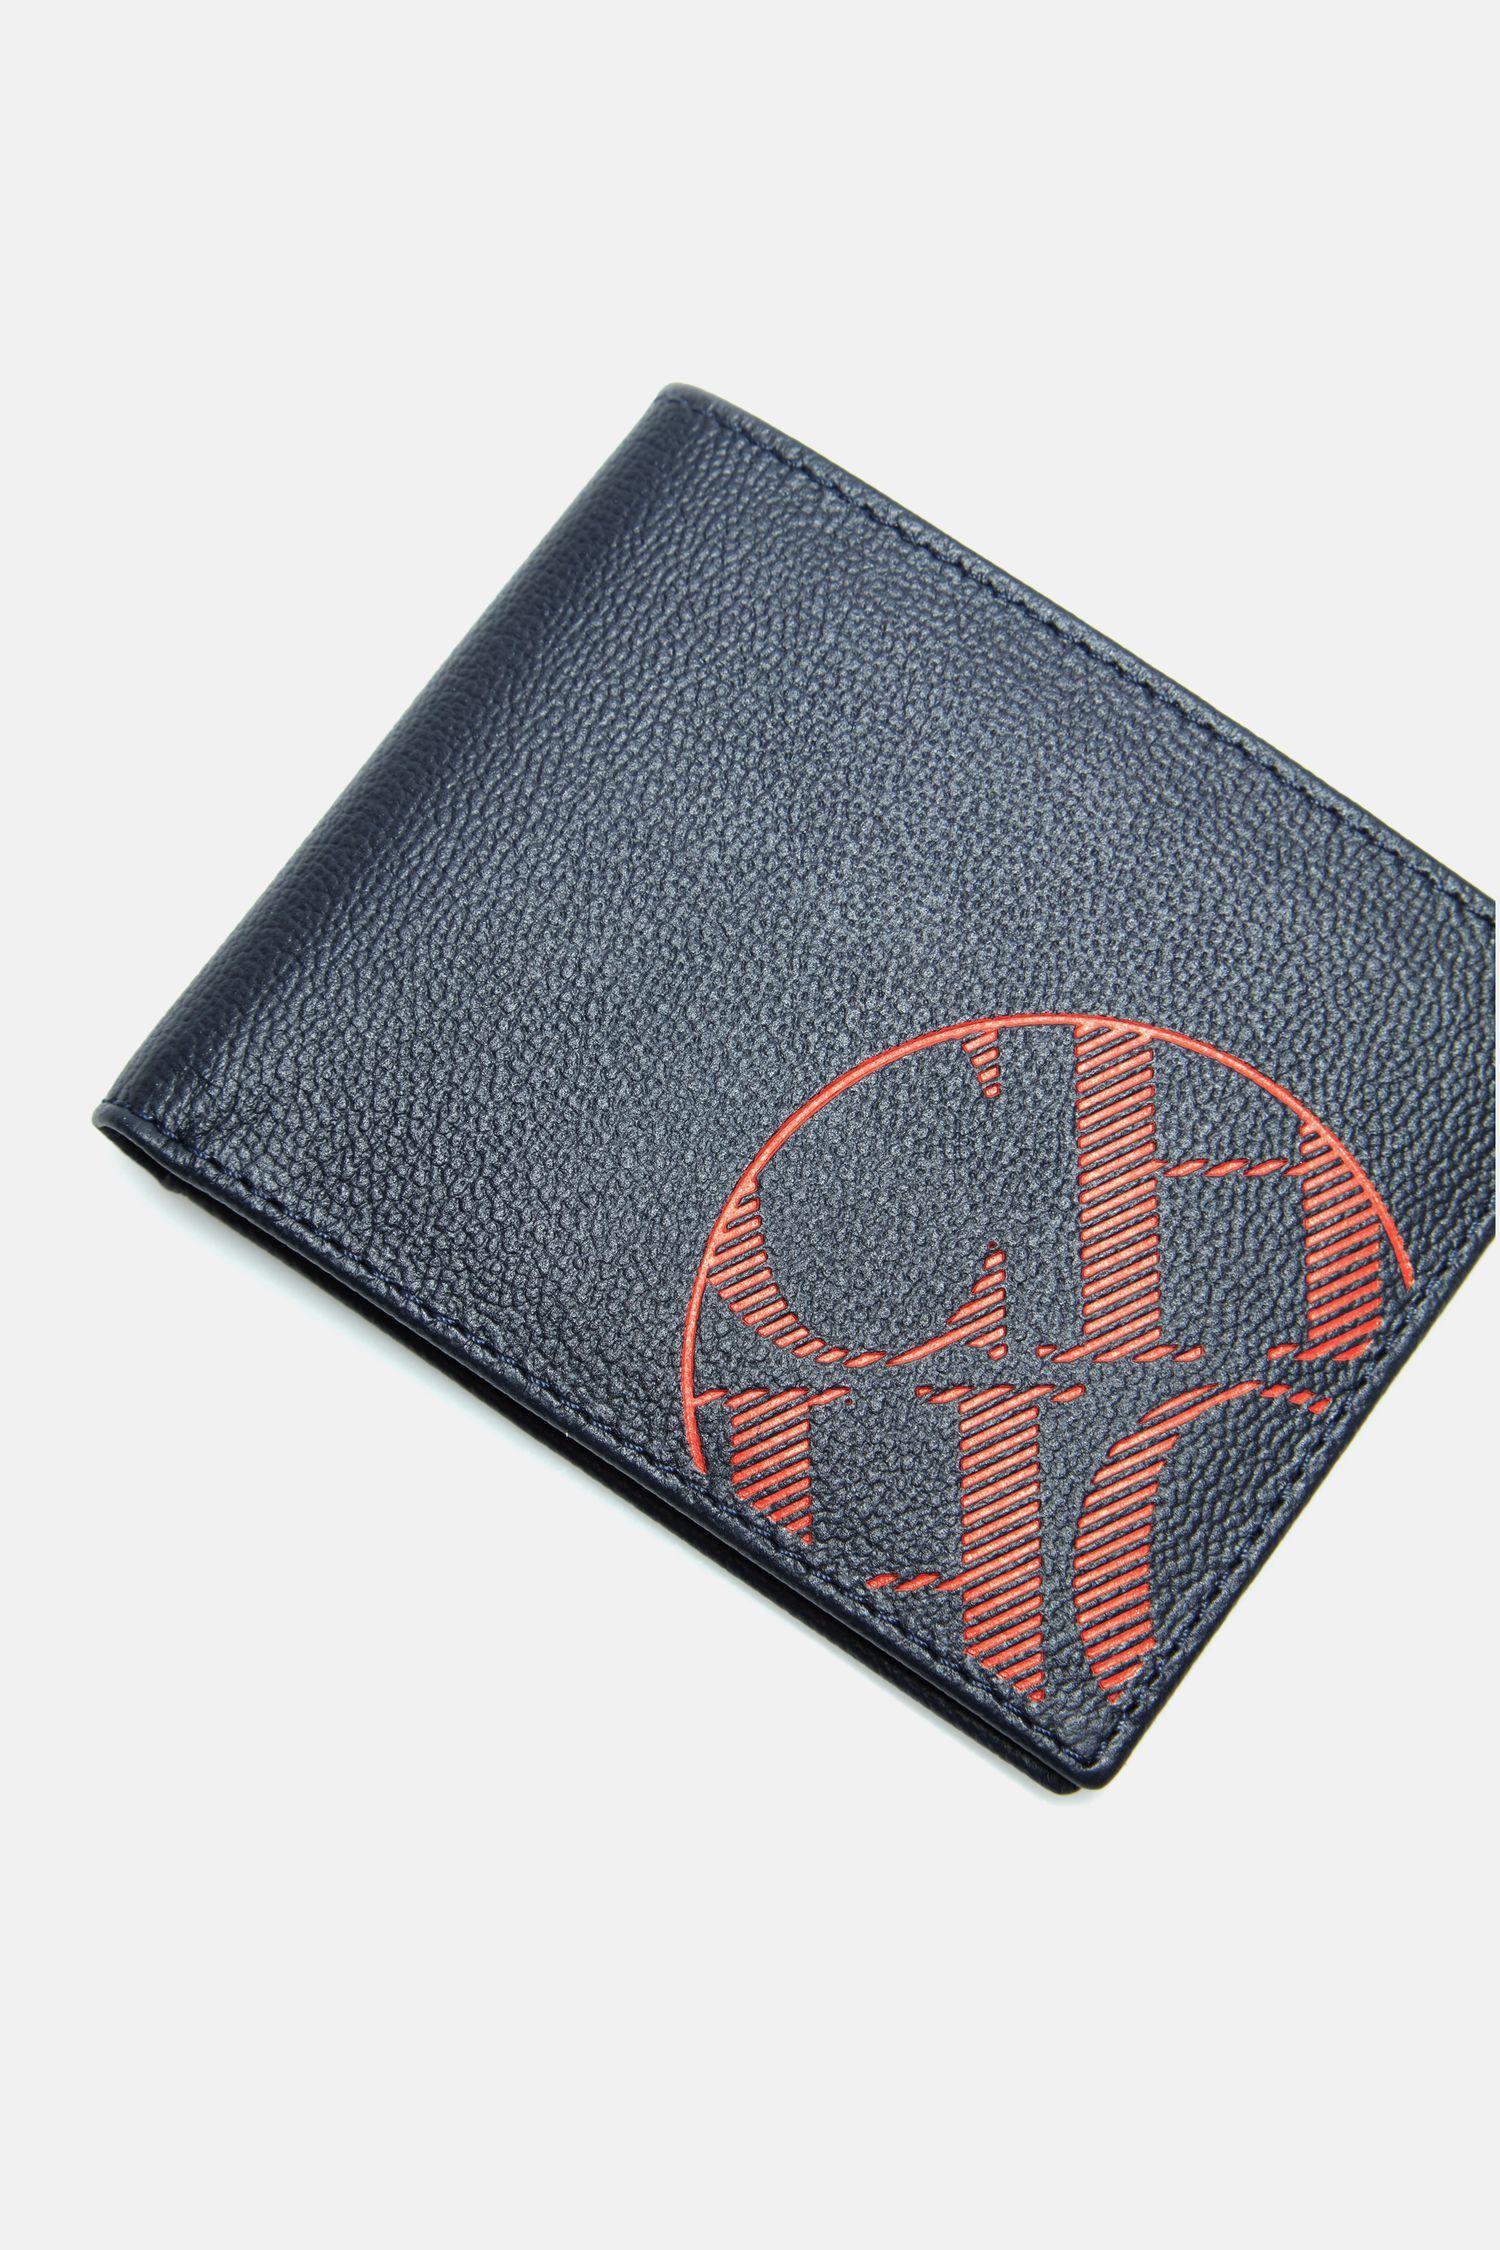 CH Sport | Billfold 6 wallet